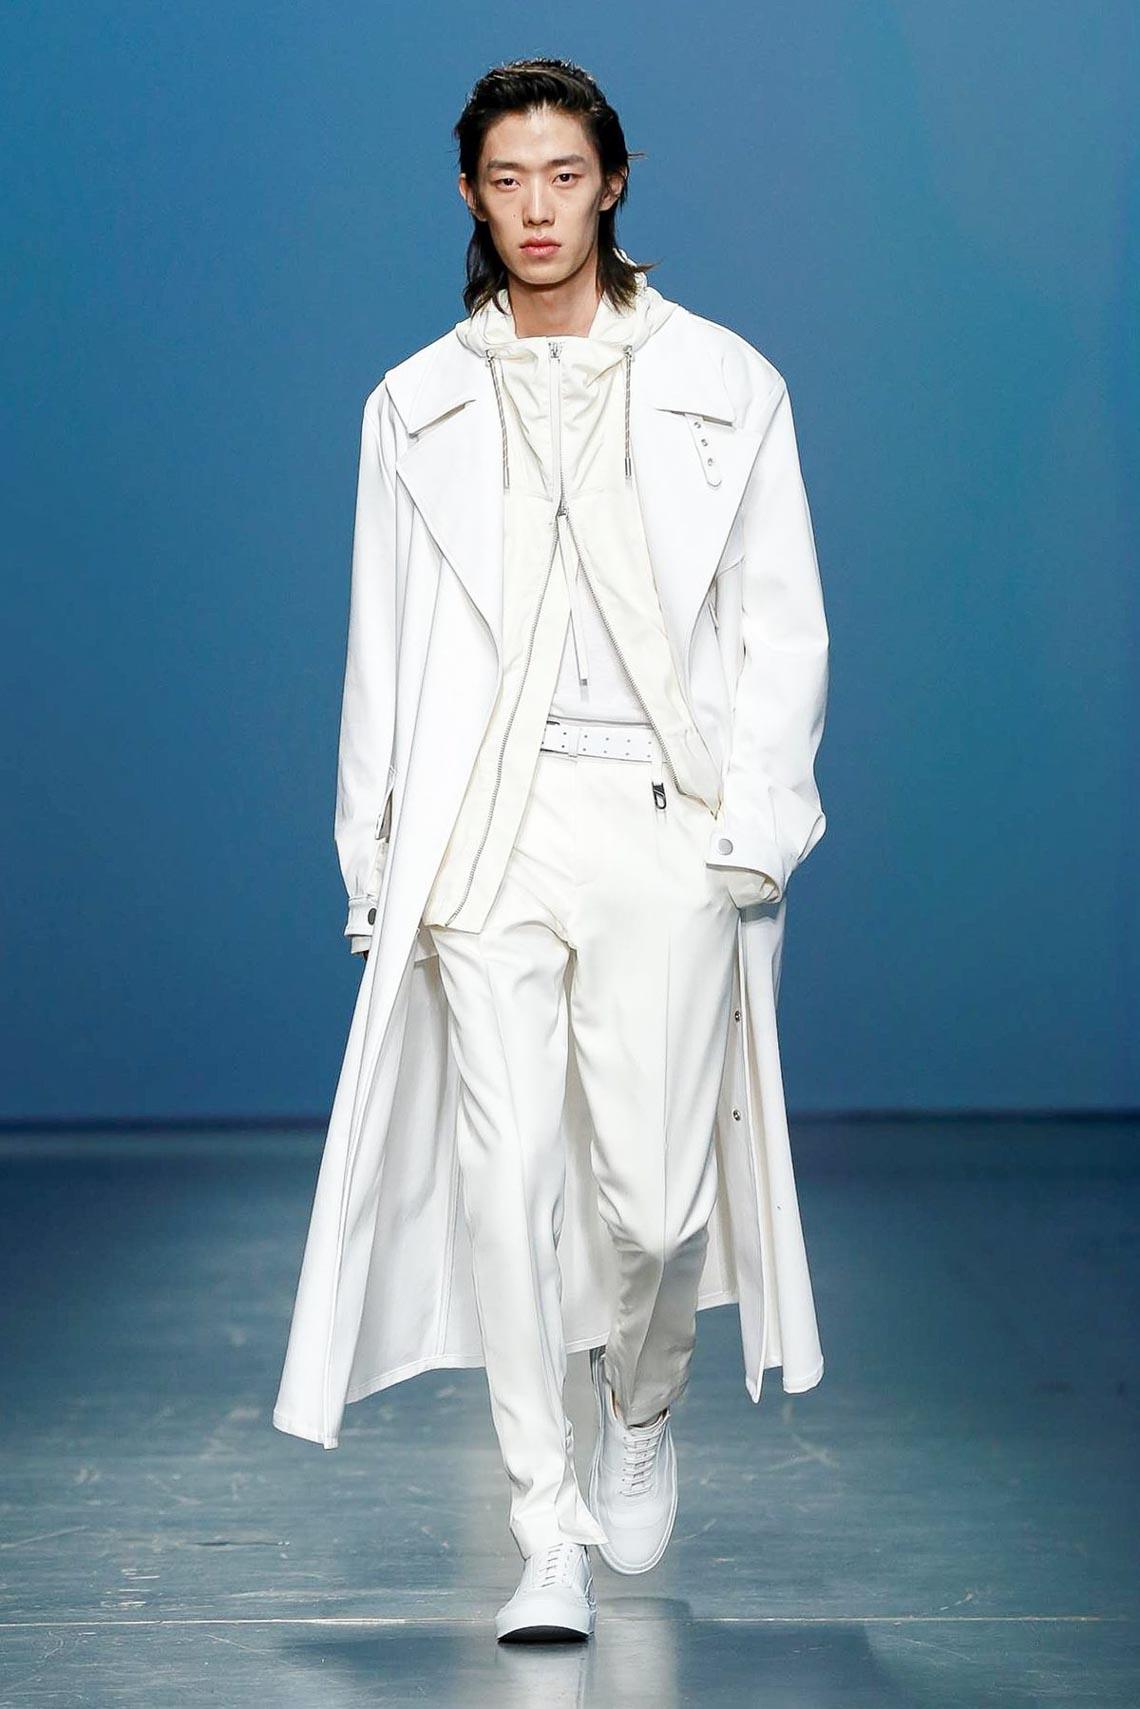 BST BOSS Individuals Xuân-Hè 2020 tại Milan Fashion Week - 9